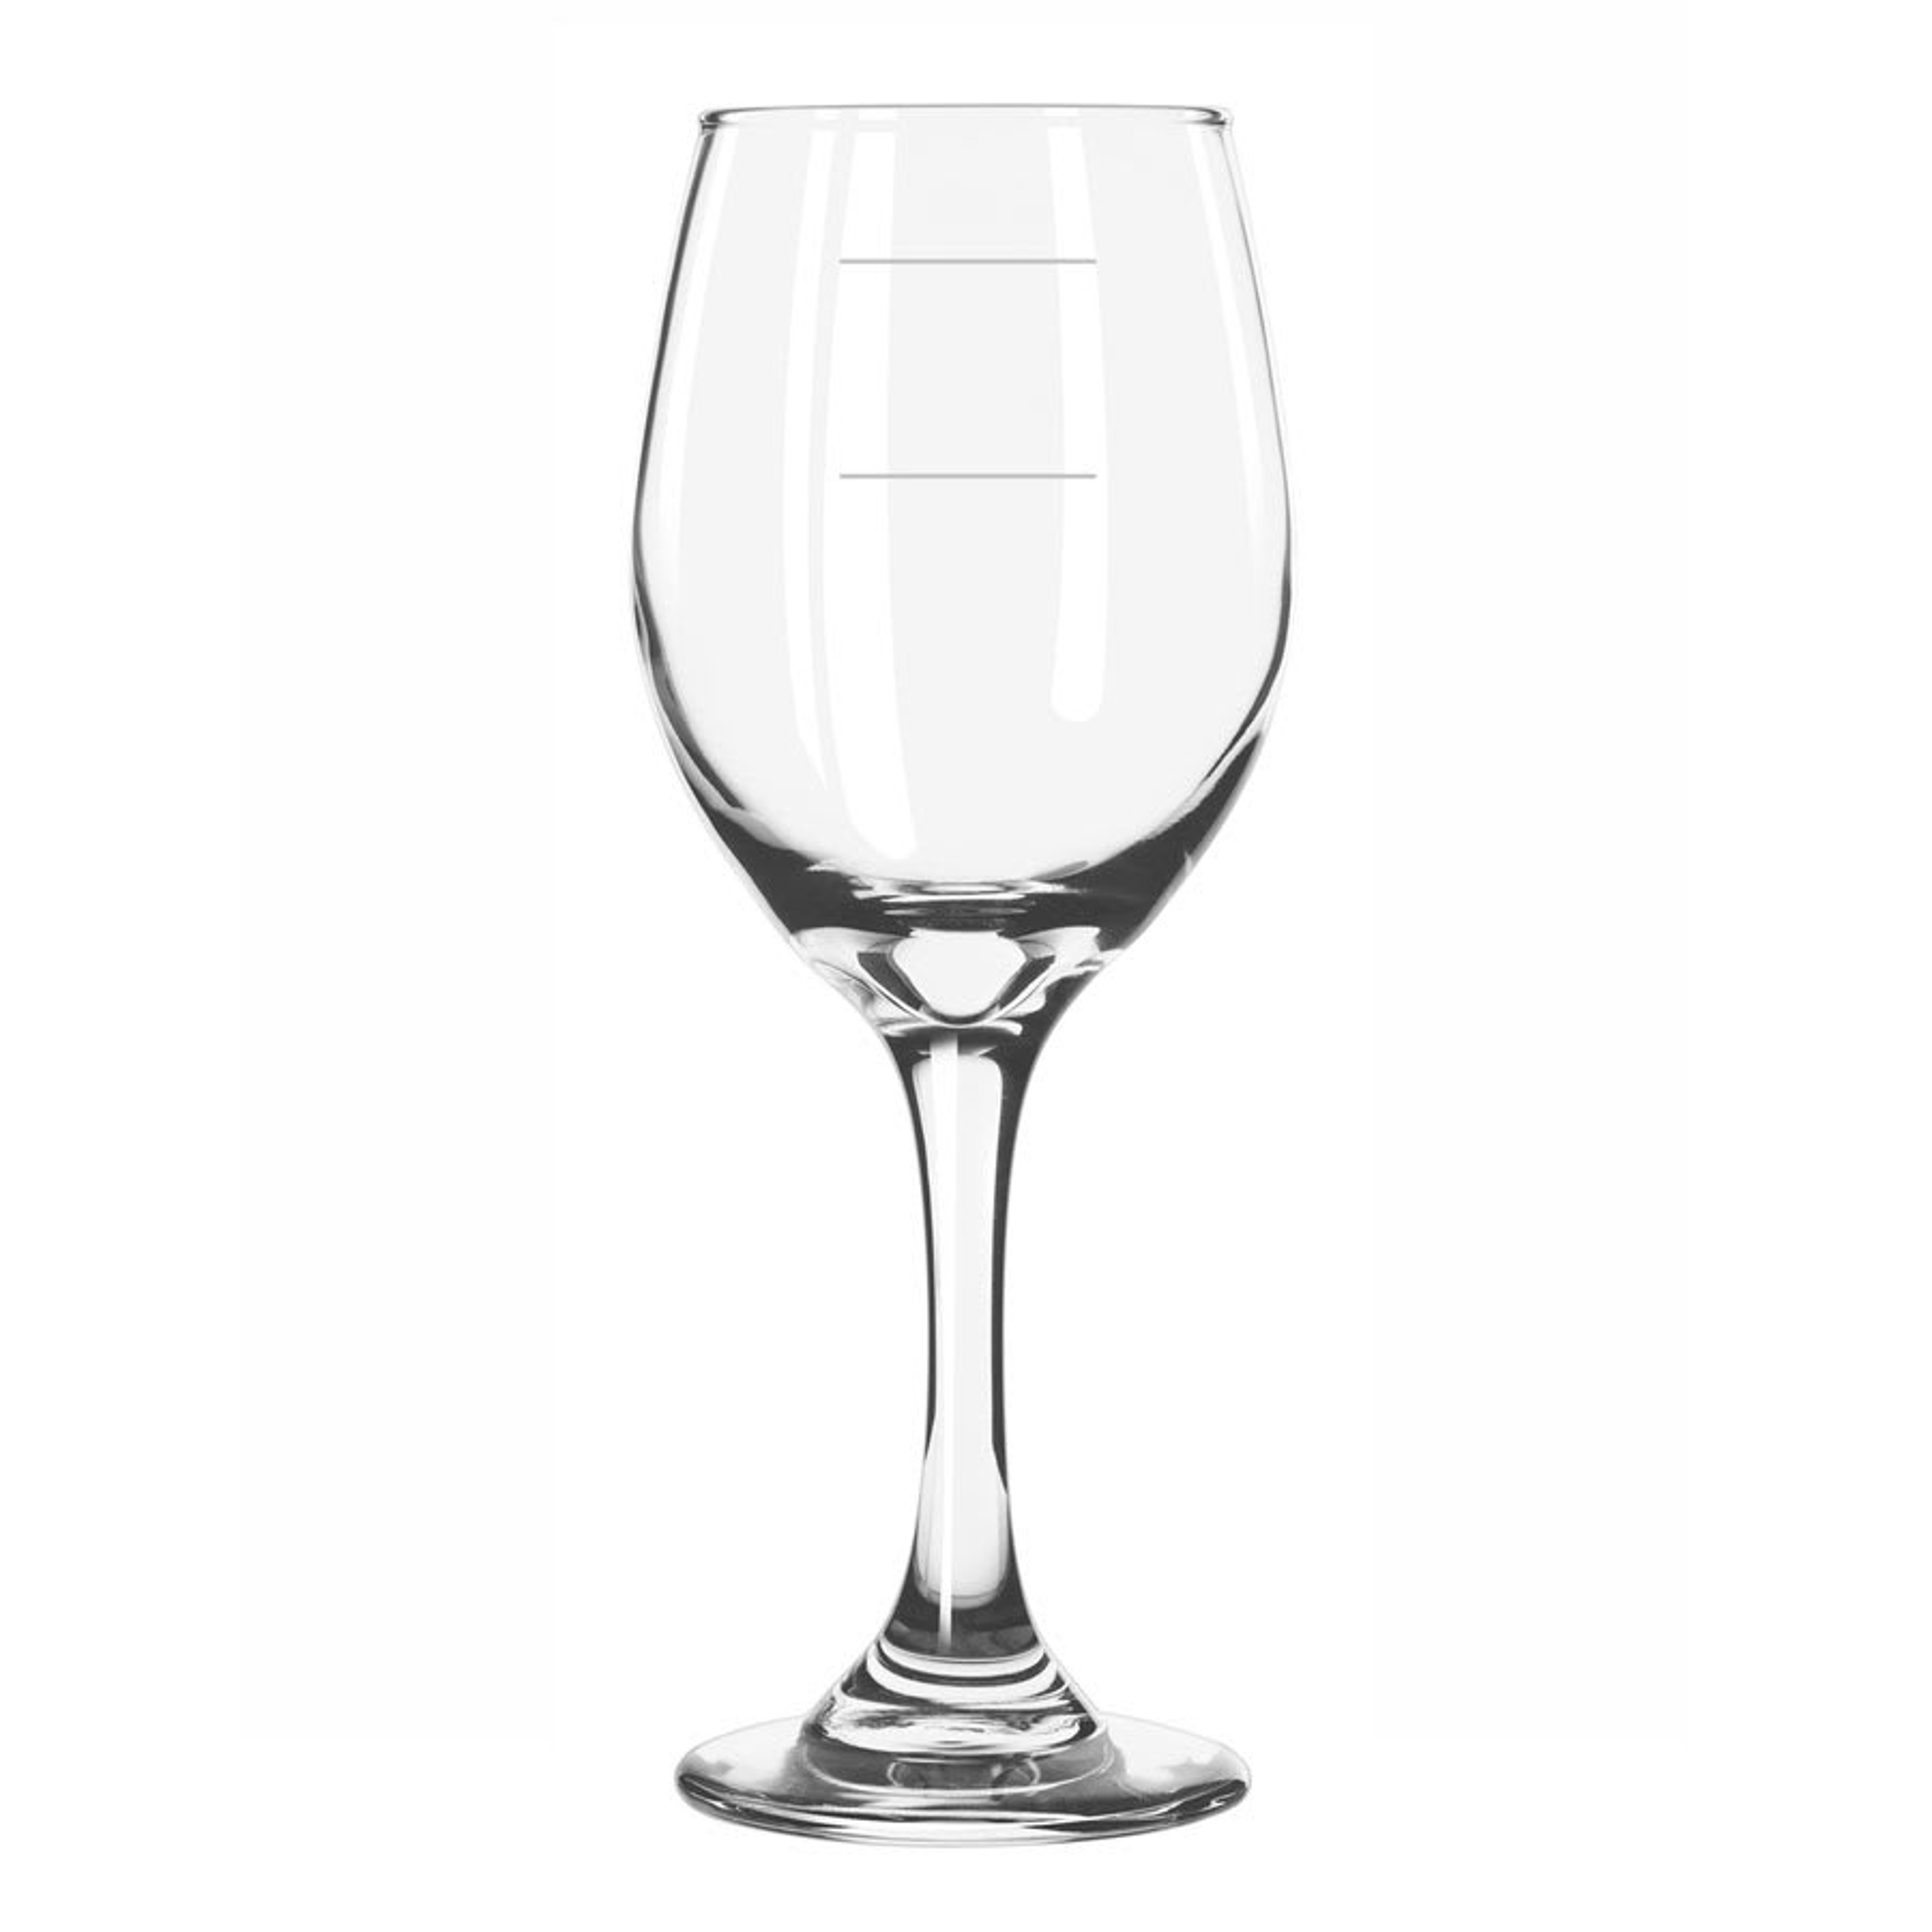 Libbey 3057/1178N 11 oz Perception Wine Glass